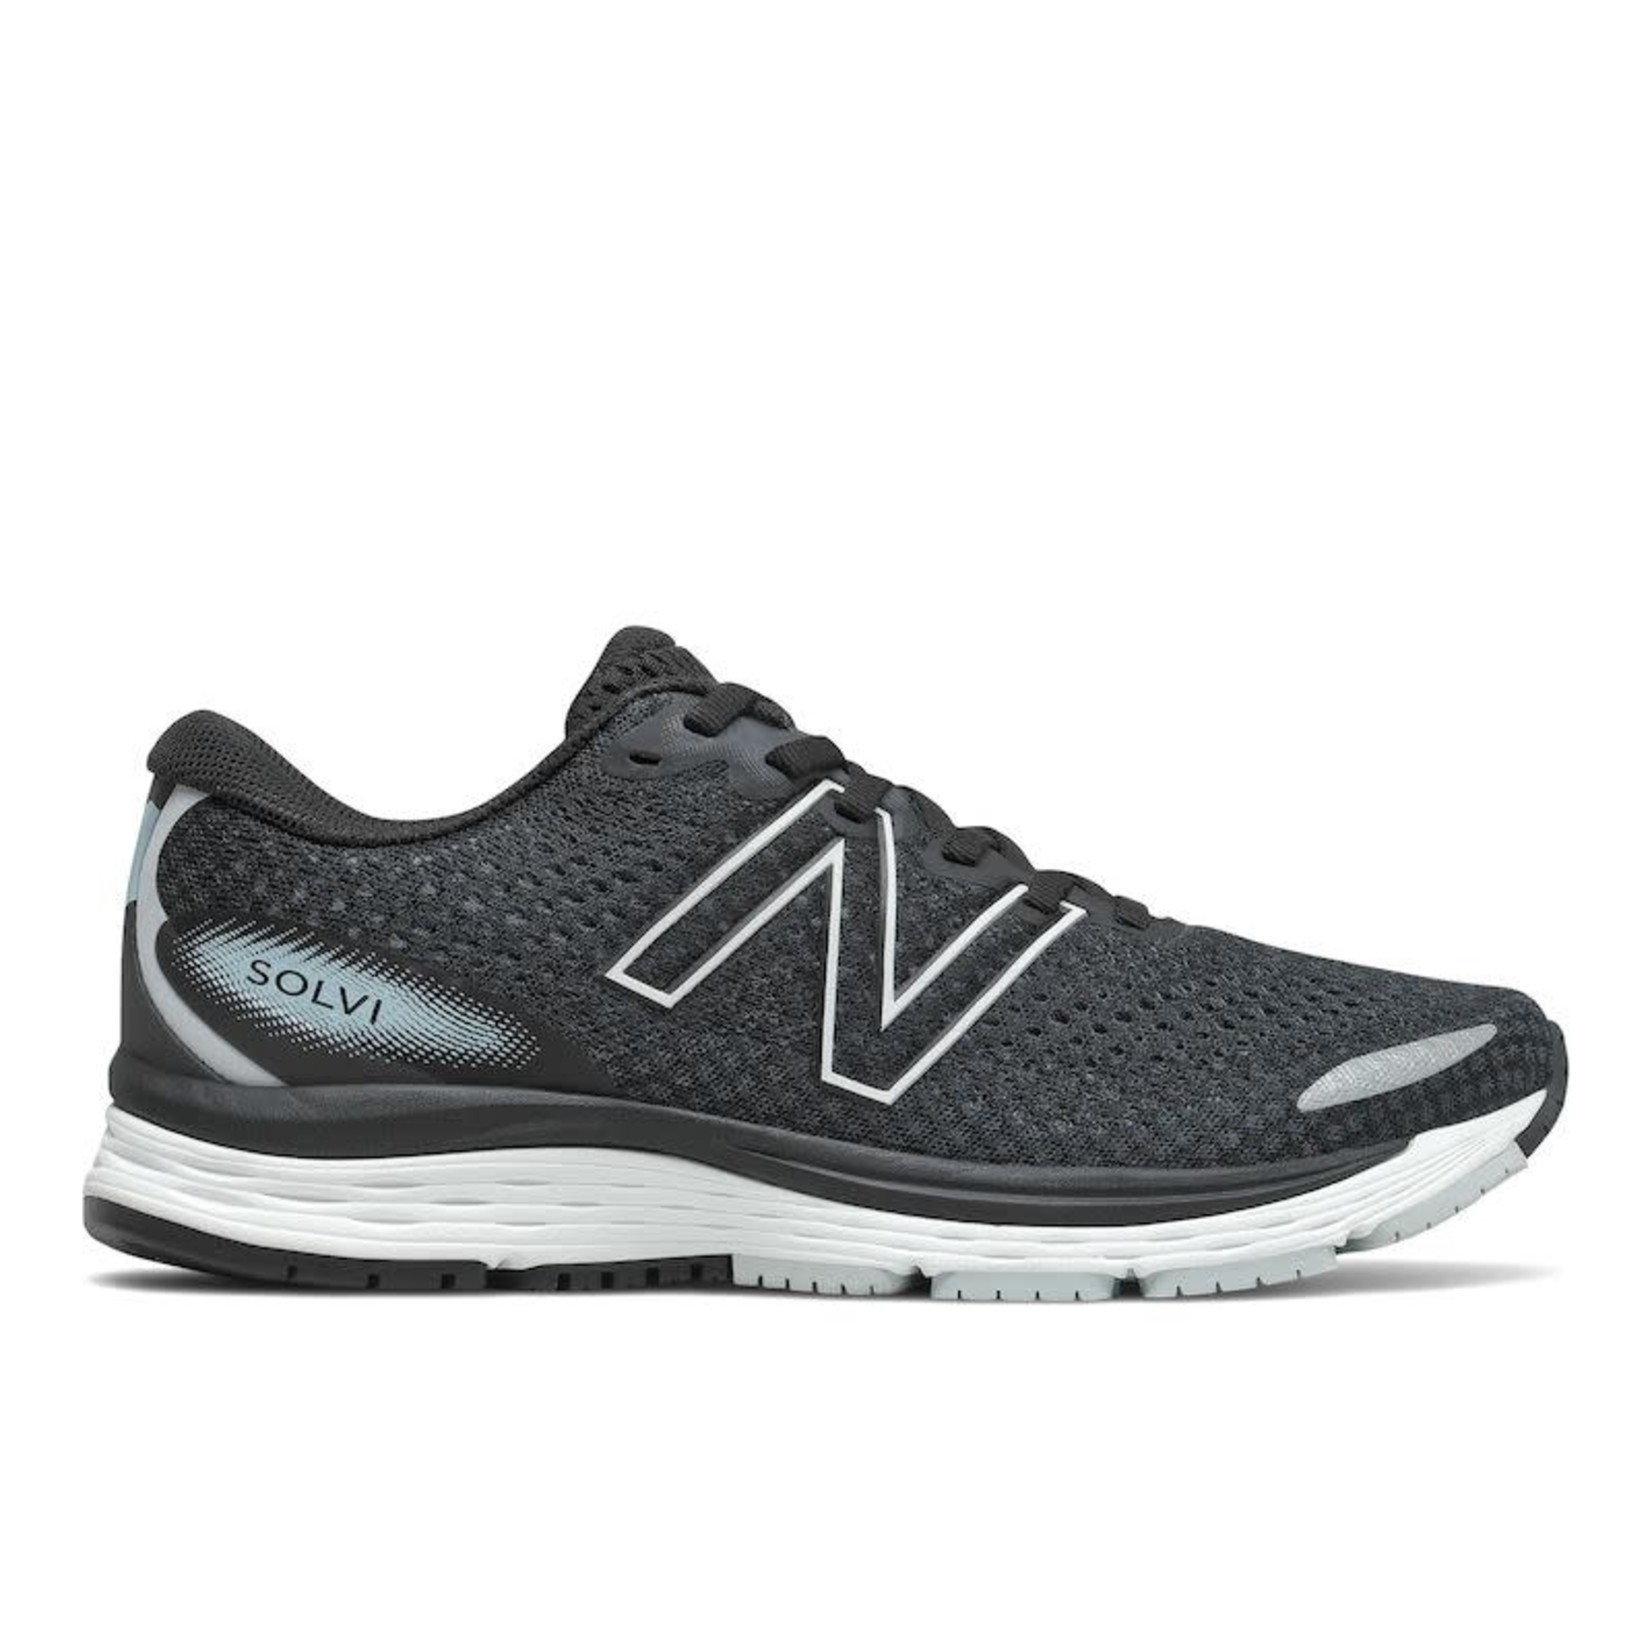 New Balance New Balance Running Shoes, Solvi v3 WSOLVLK3, Ladies